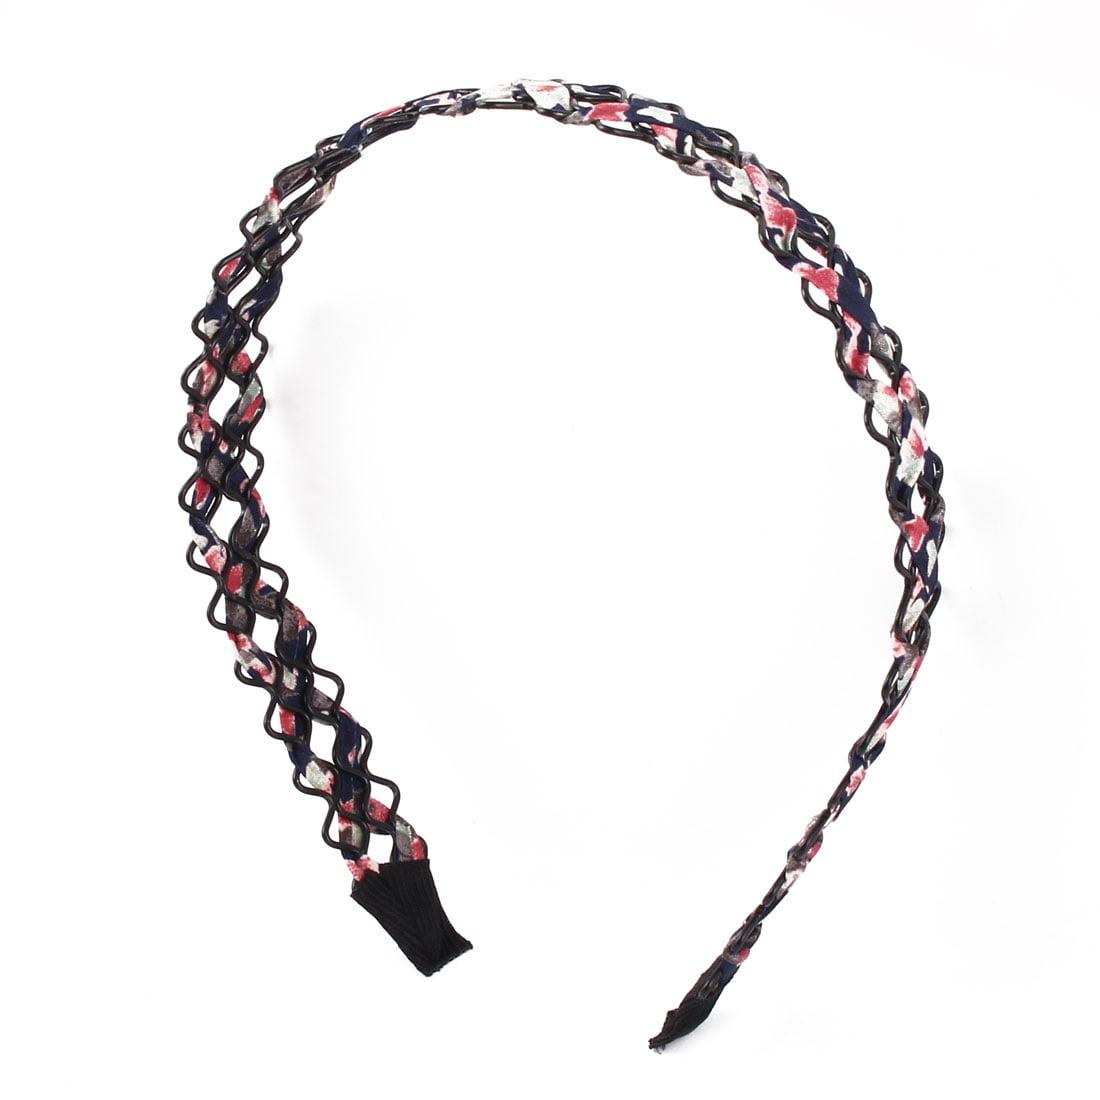 Unique BargainsWoman Lady Fabric Overlapped Braided Pattern Broadside Headband Hair Hoop